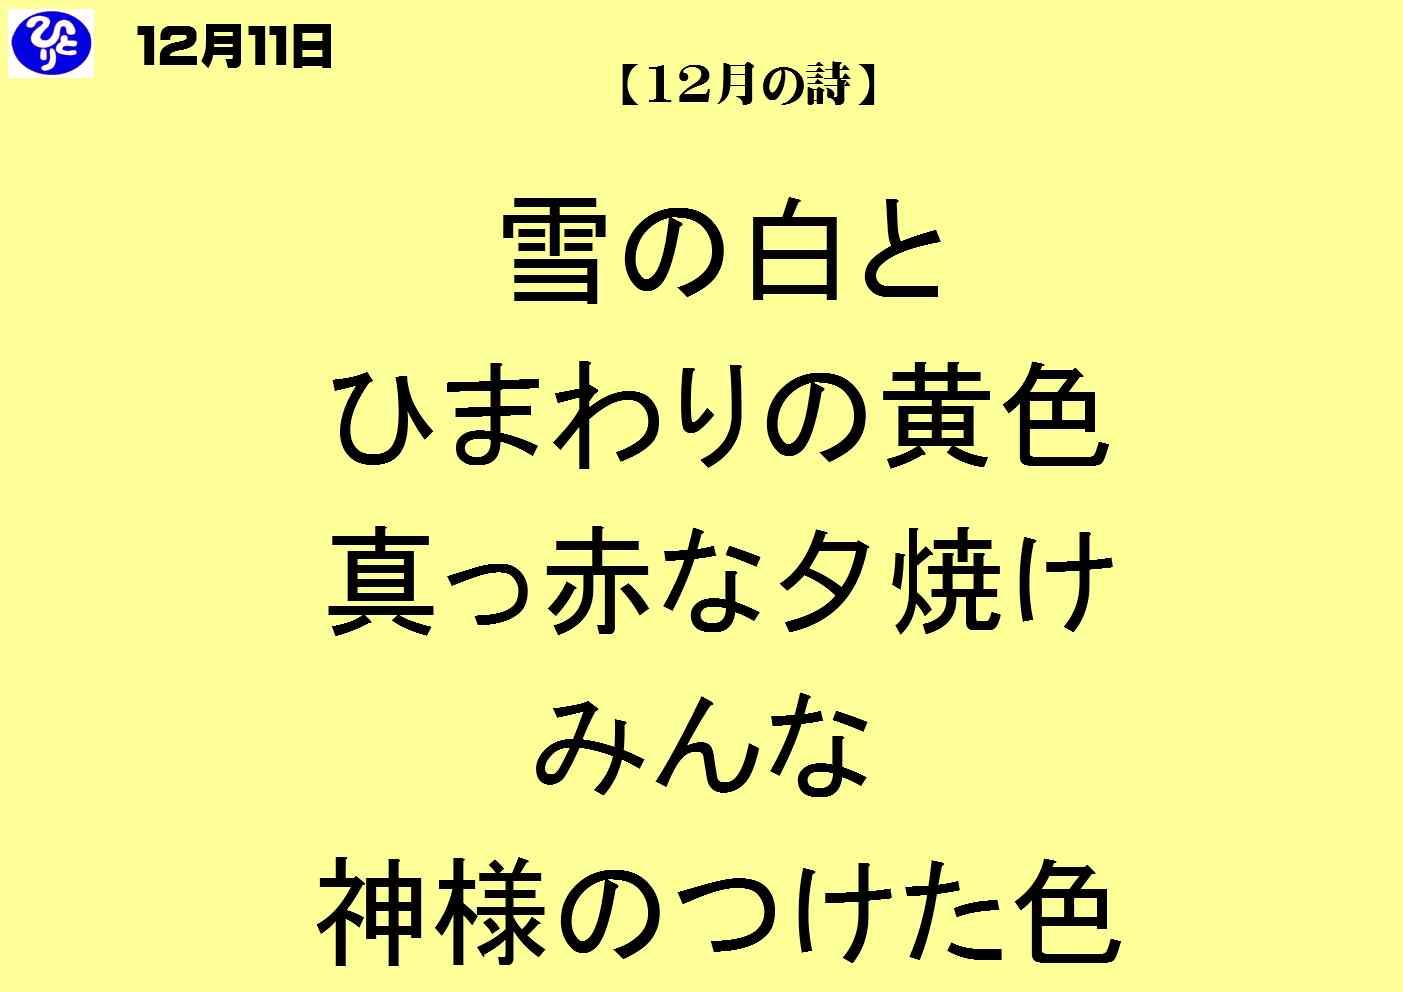 12月11日|12月の詩|仕事一日一語斎藤一人